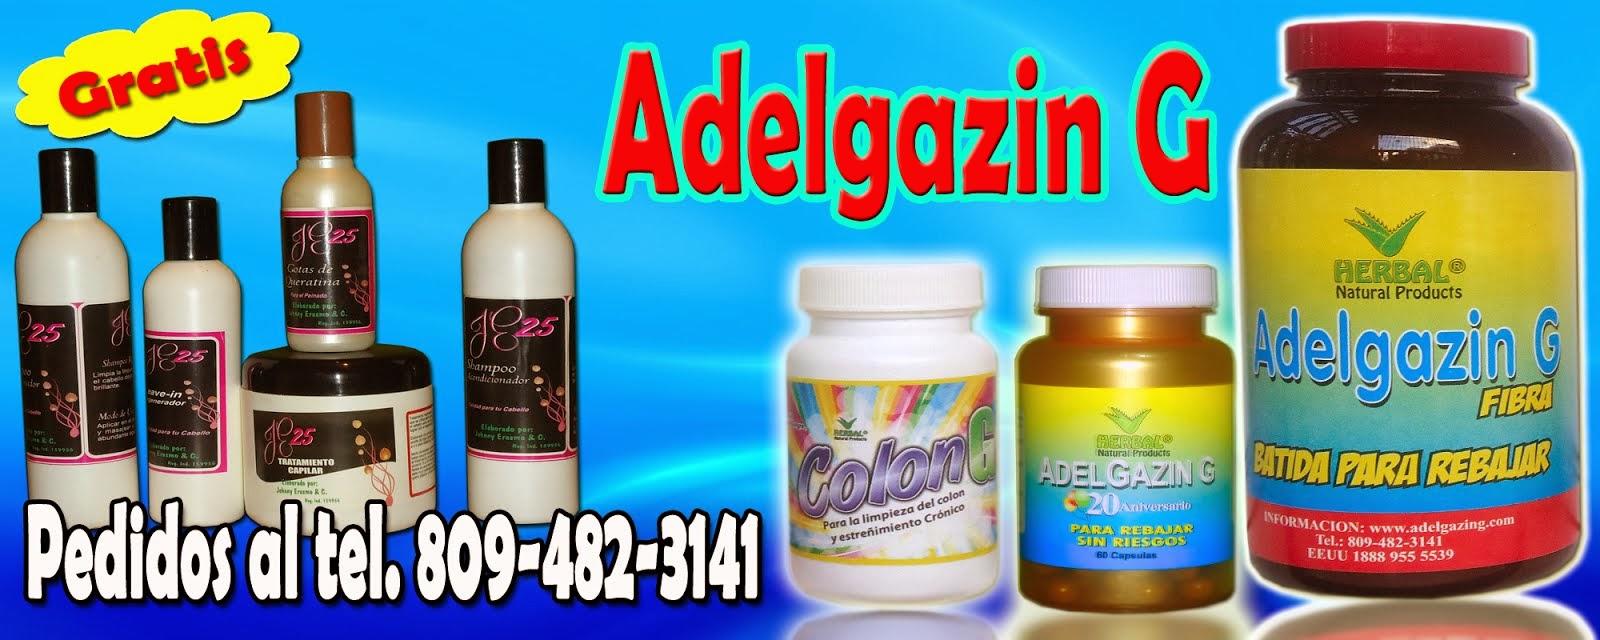 Oferta de Adelgazin G, Linea para el cabello Gratis